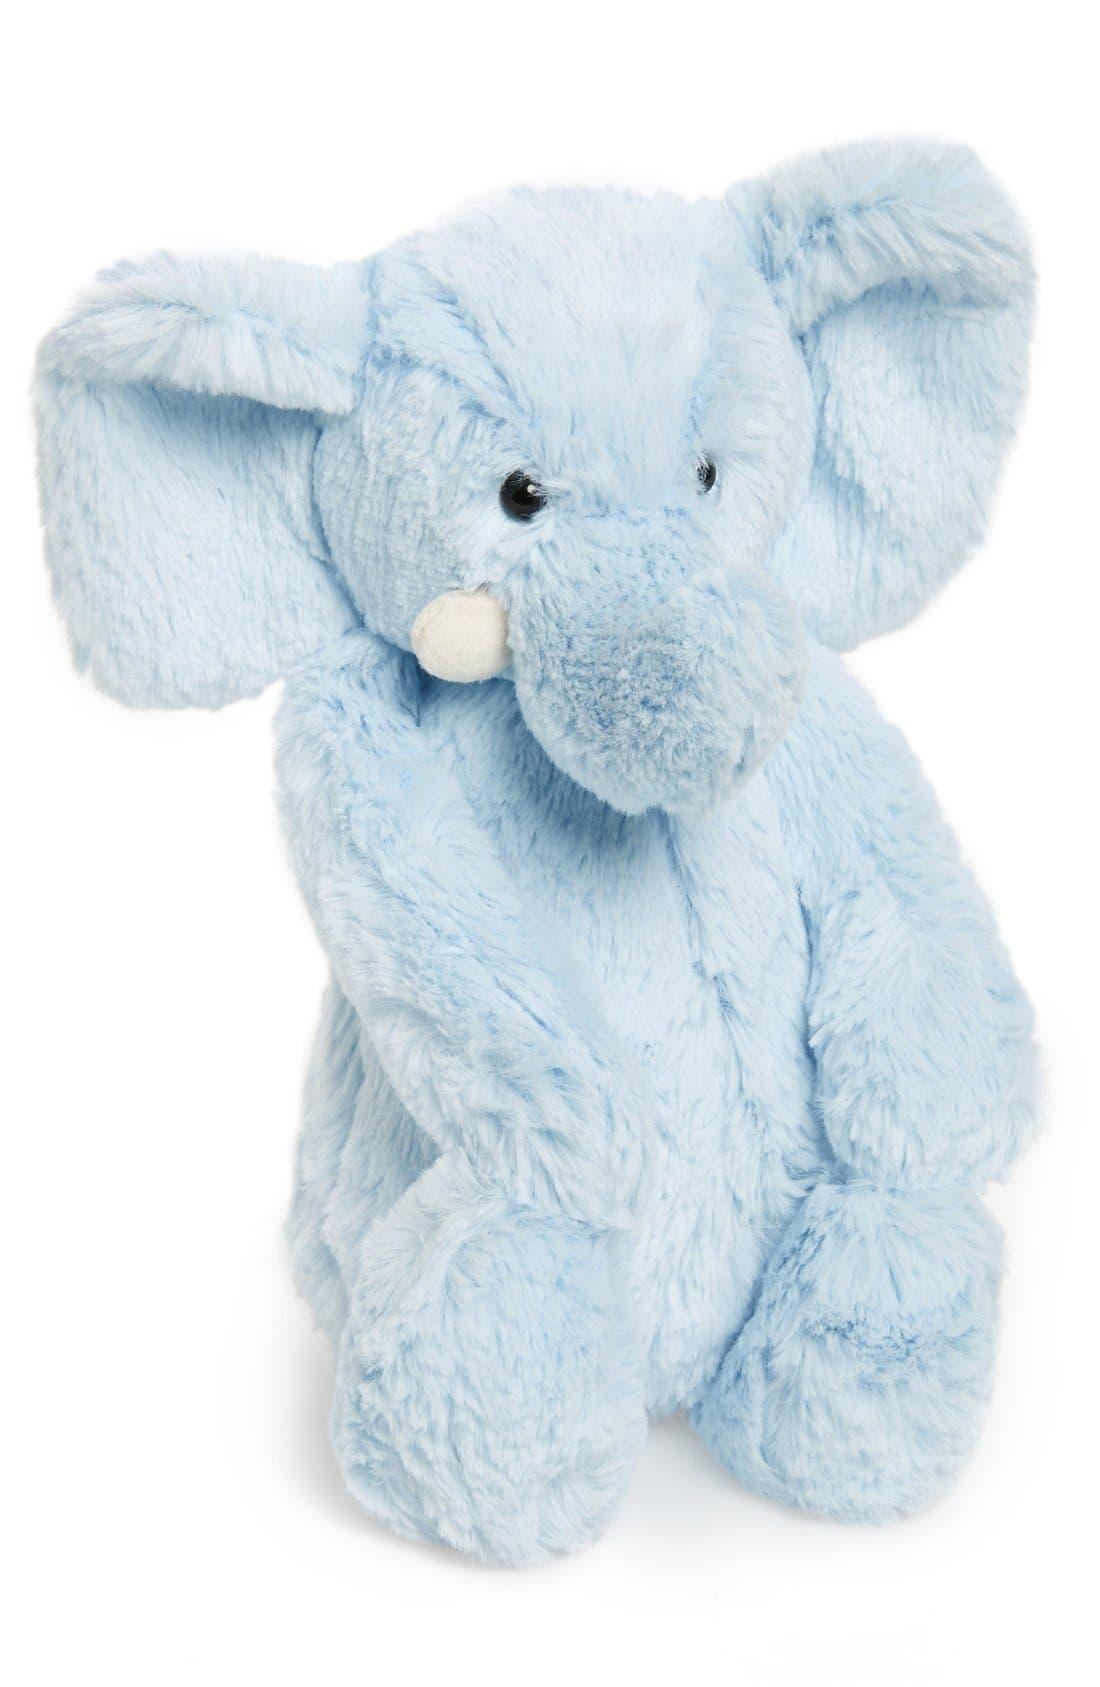 Chime Stuffed Elephant,                             Main thumbnail 1, color,                             450